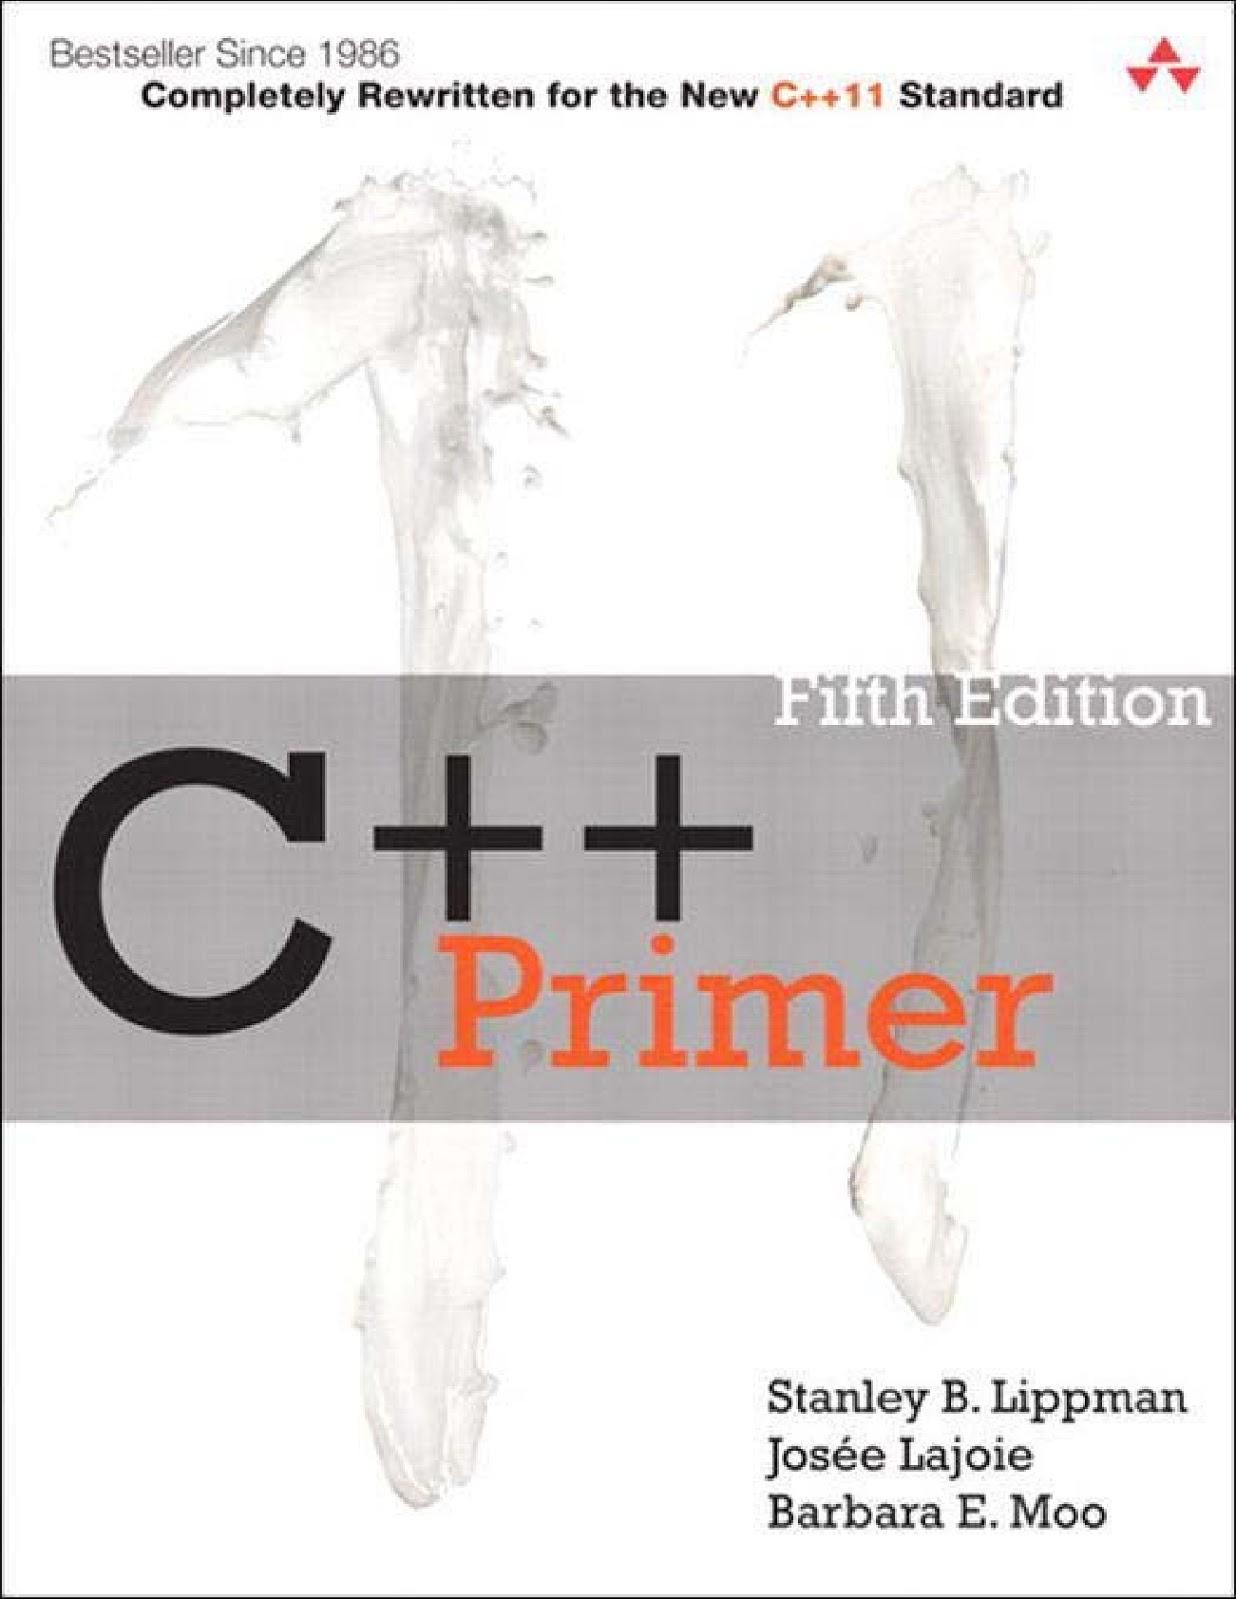 C Primer 5th Edition Pdf